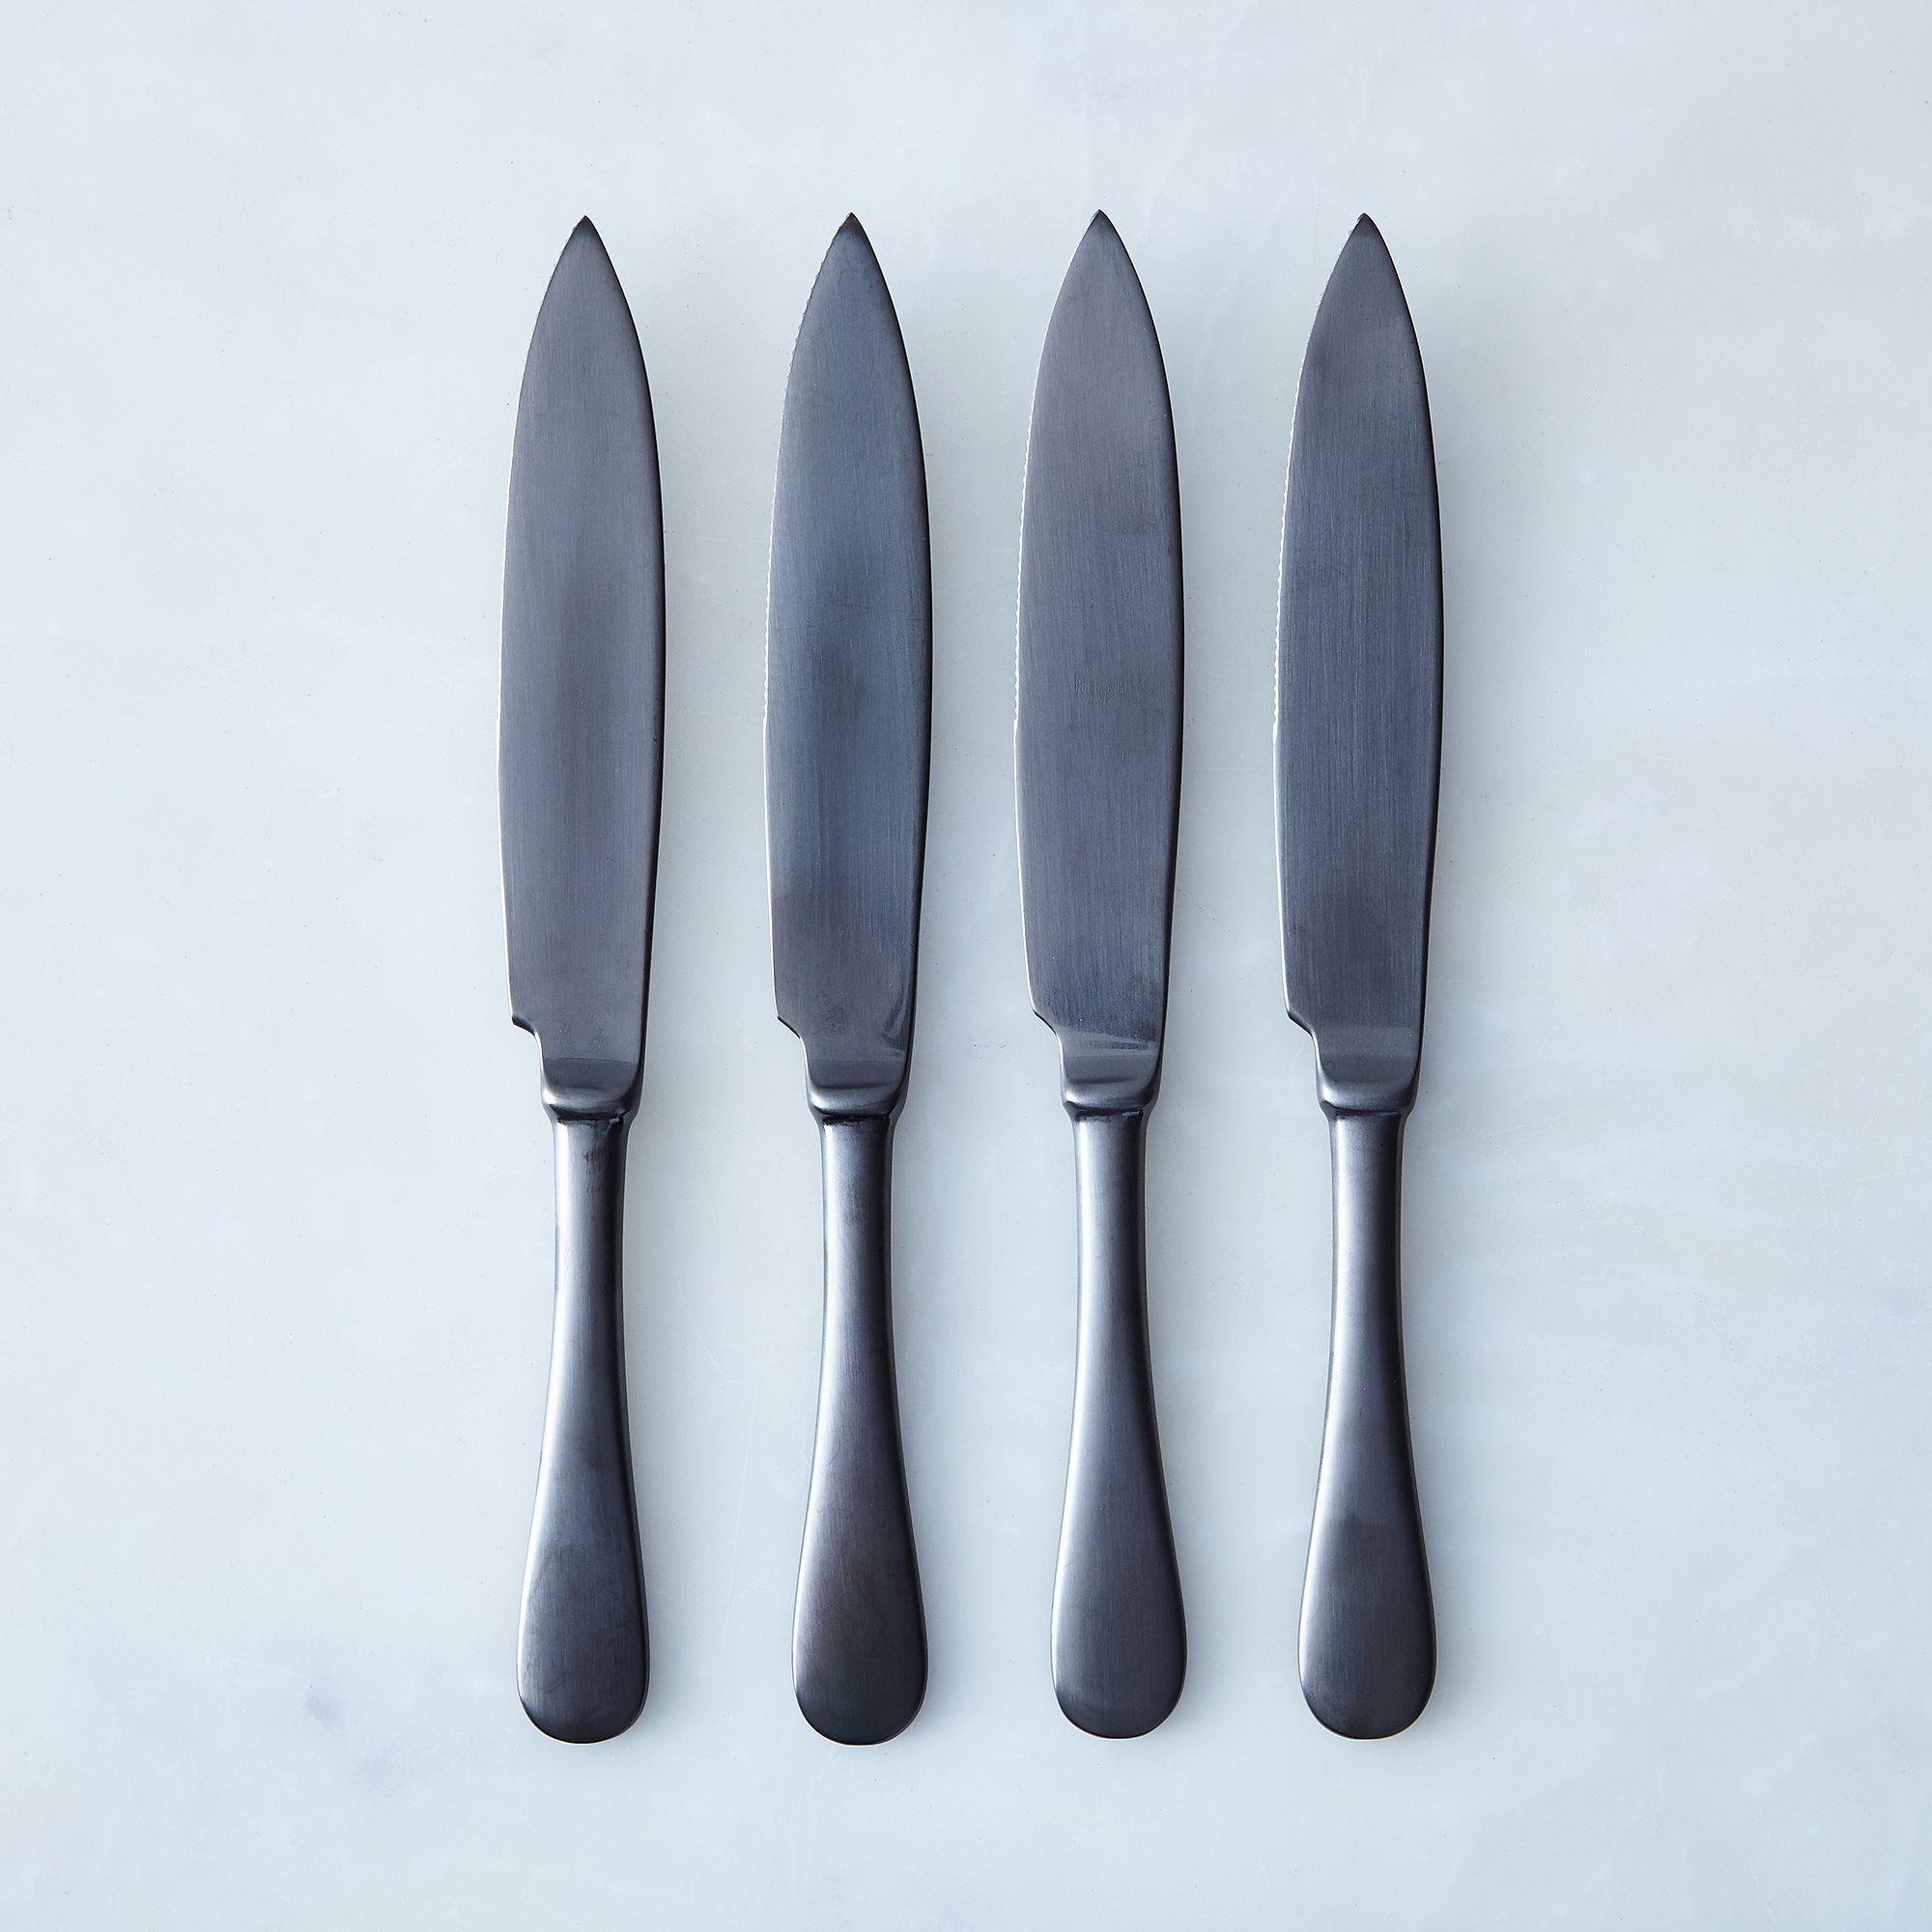 7a7dd151 0877 4c22 8f25 bd652caafb9a  2017 0511 mepra steak knives set of 4 black brushed detail silo rocky luten 002